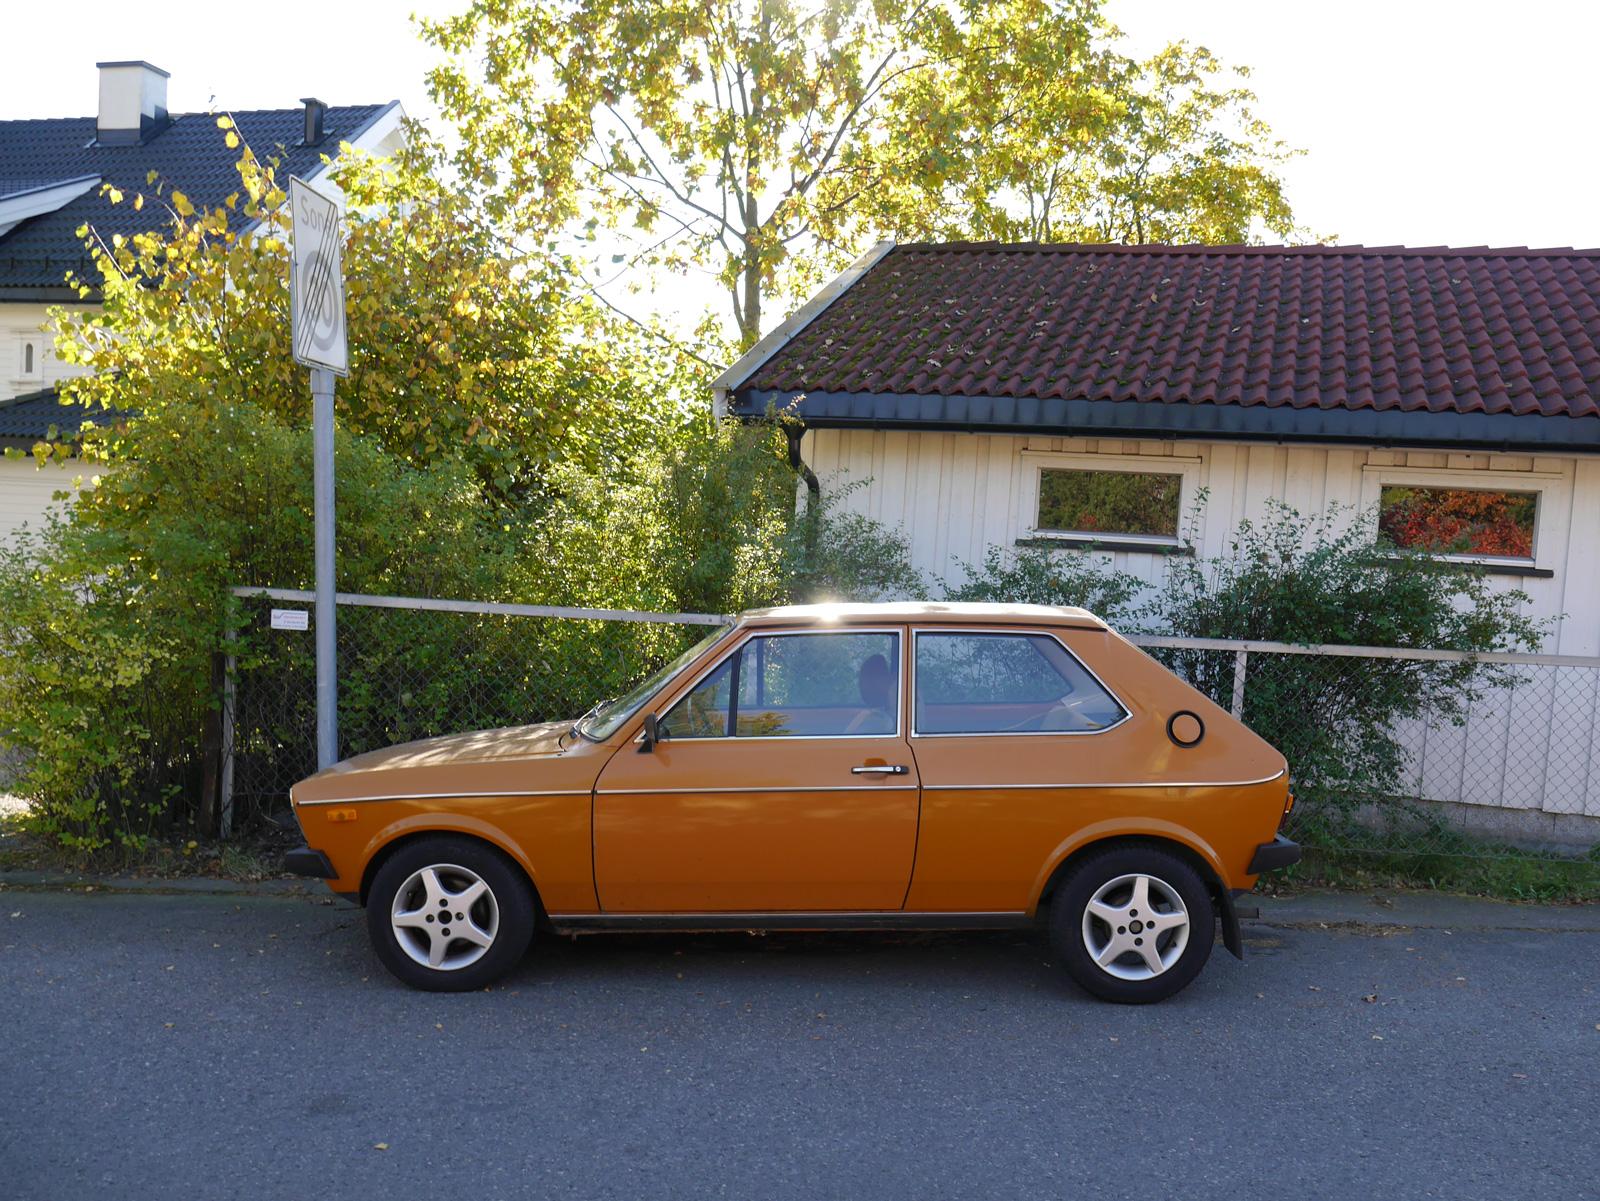 1977 Volkswagen Polo LS MK! type 86 Hatcback Oslo